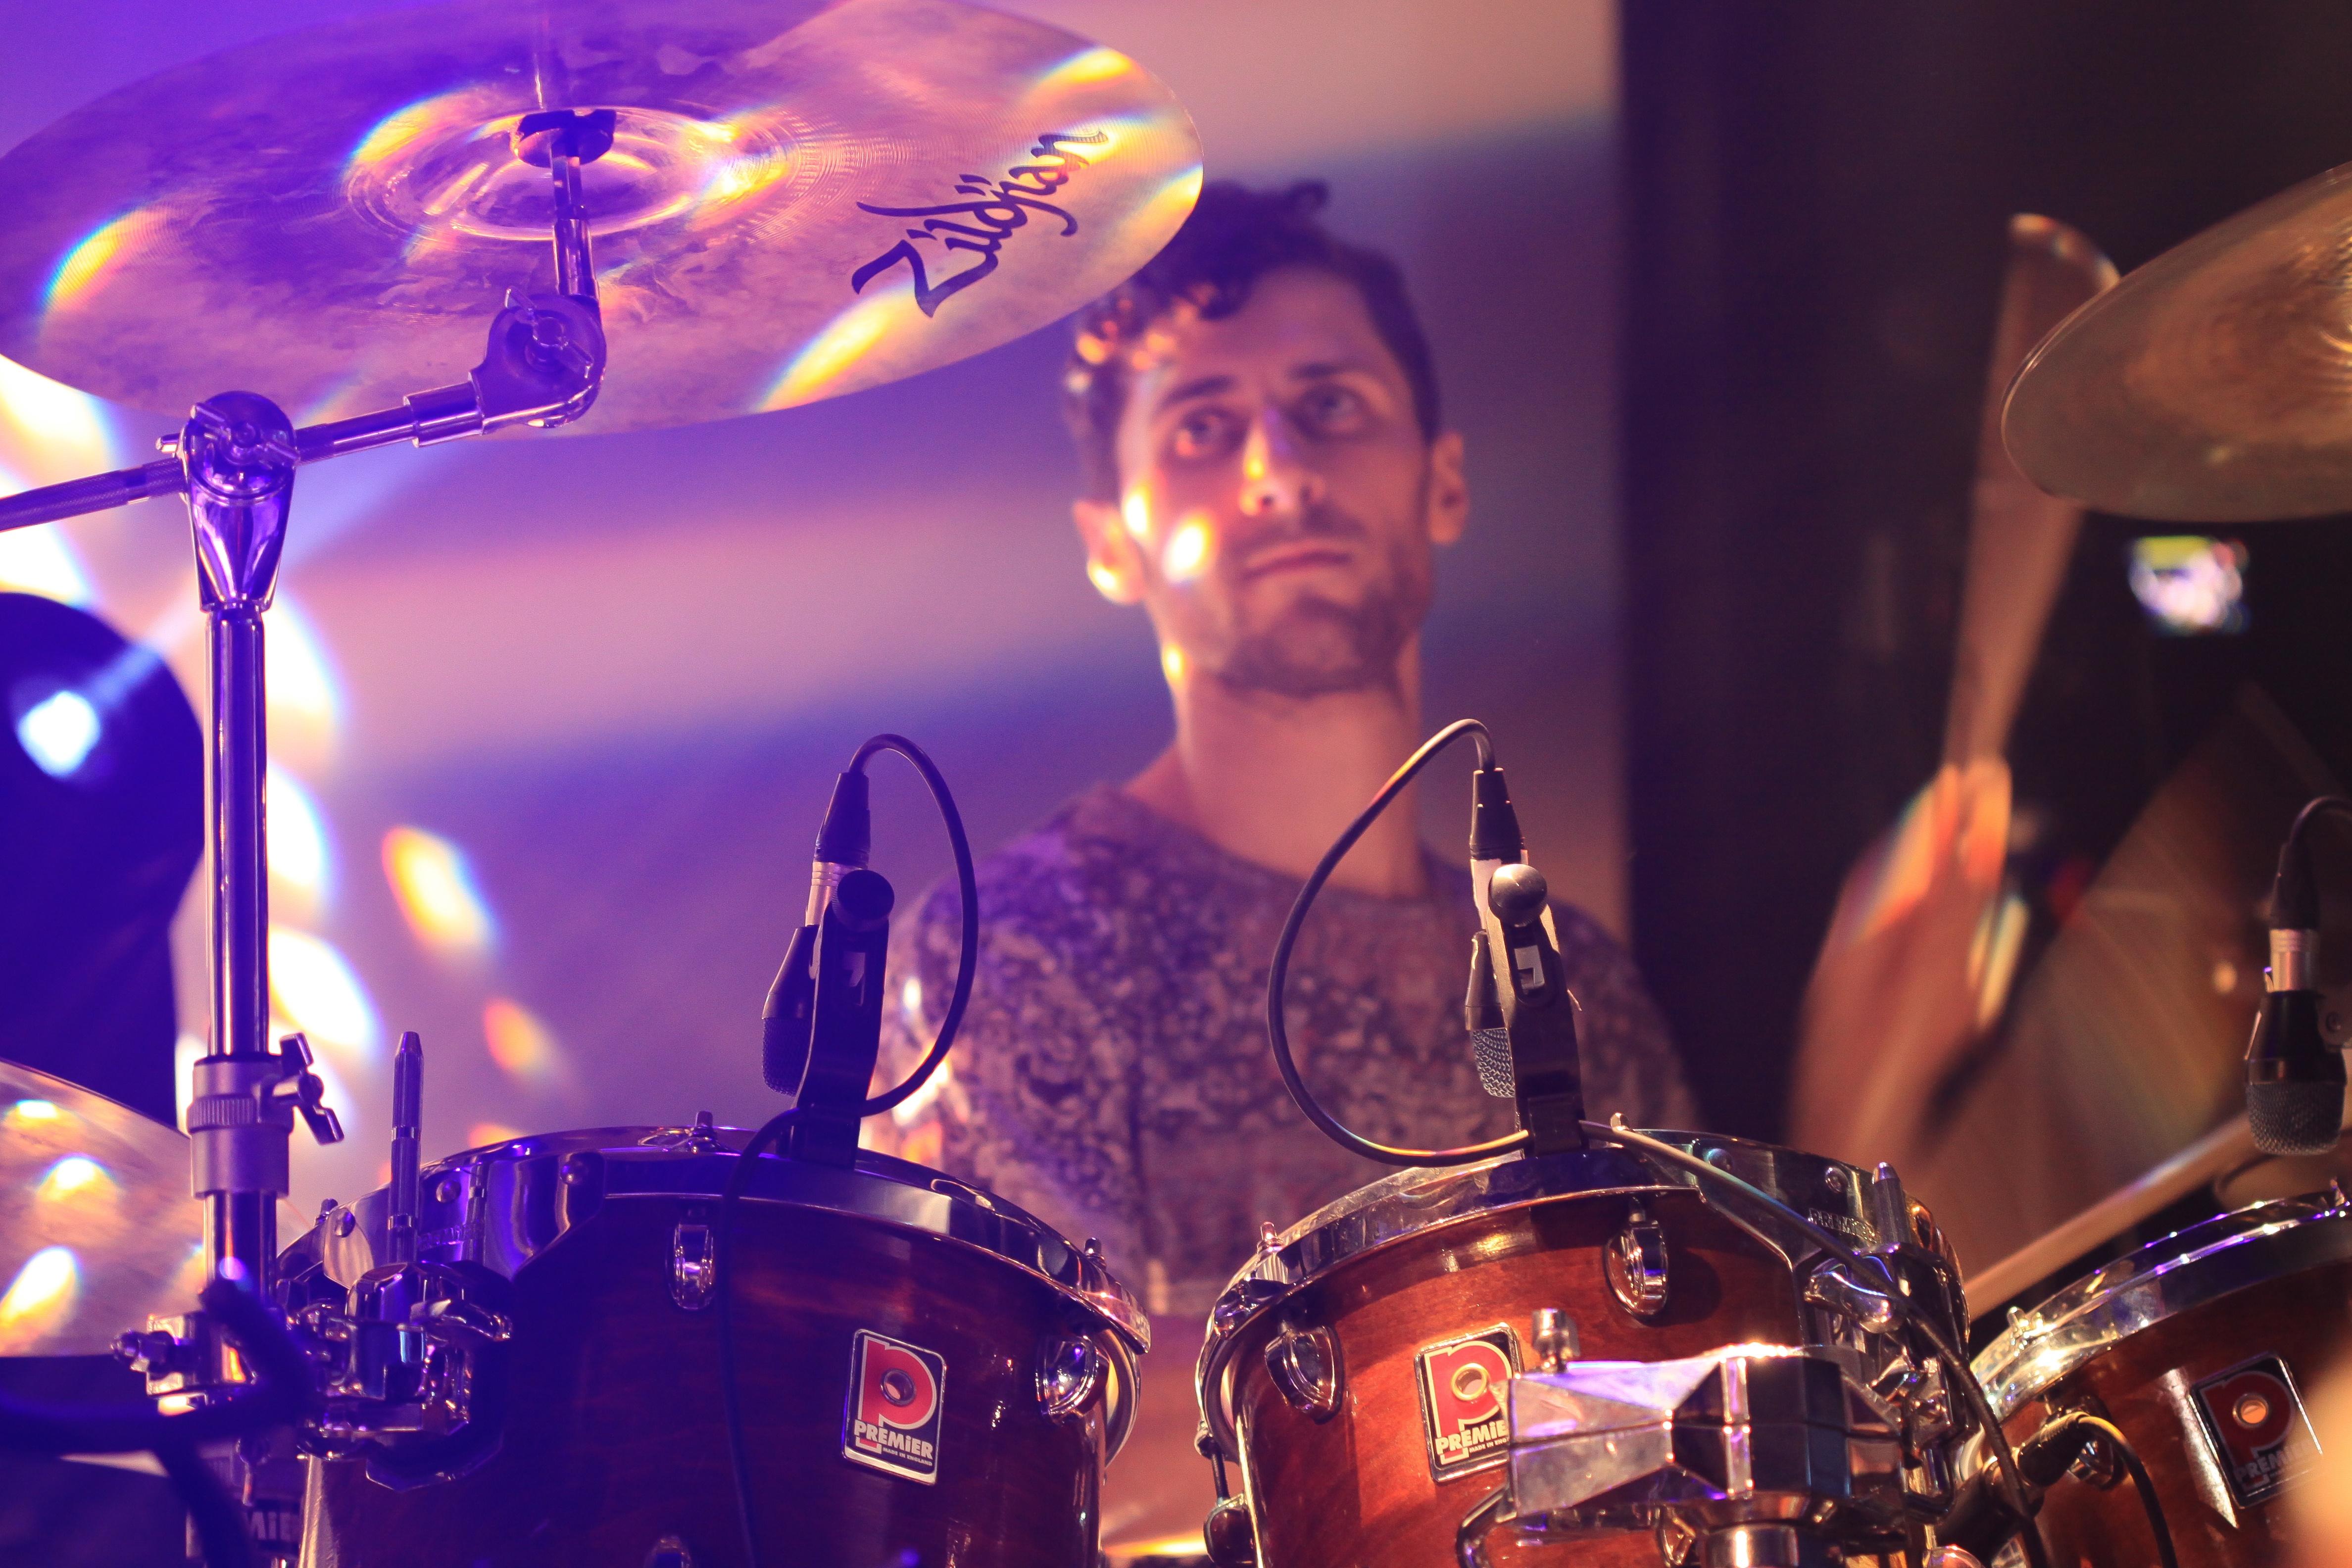 A Production Coordinator, but Still a Drummer Looking for a Good, Steady Rhythm: Robotiq's Gabriel Larivière